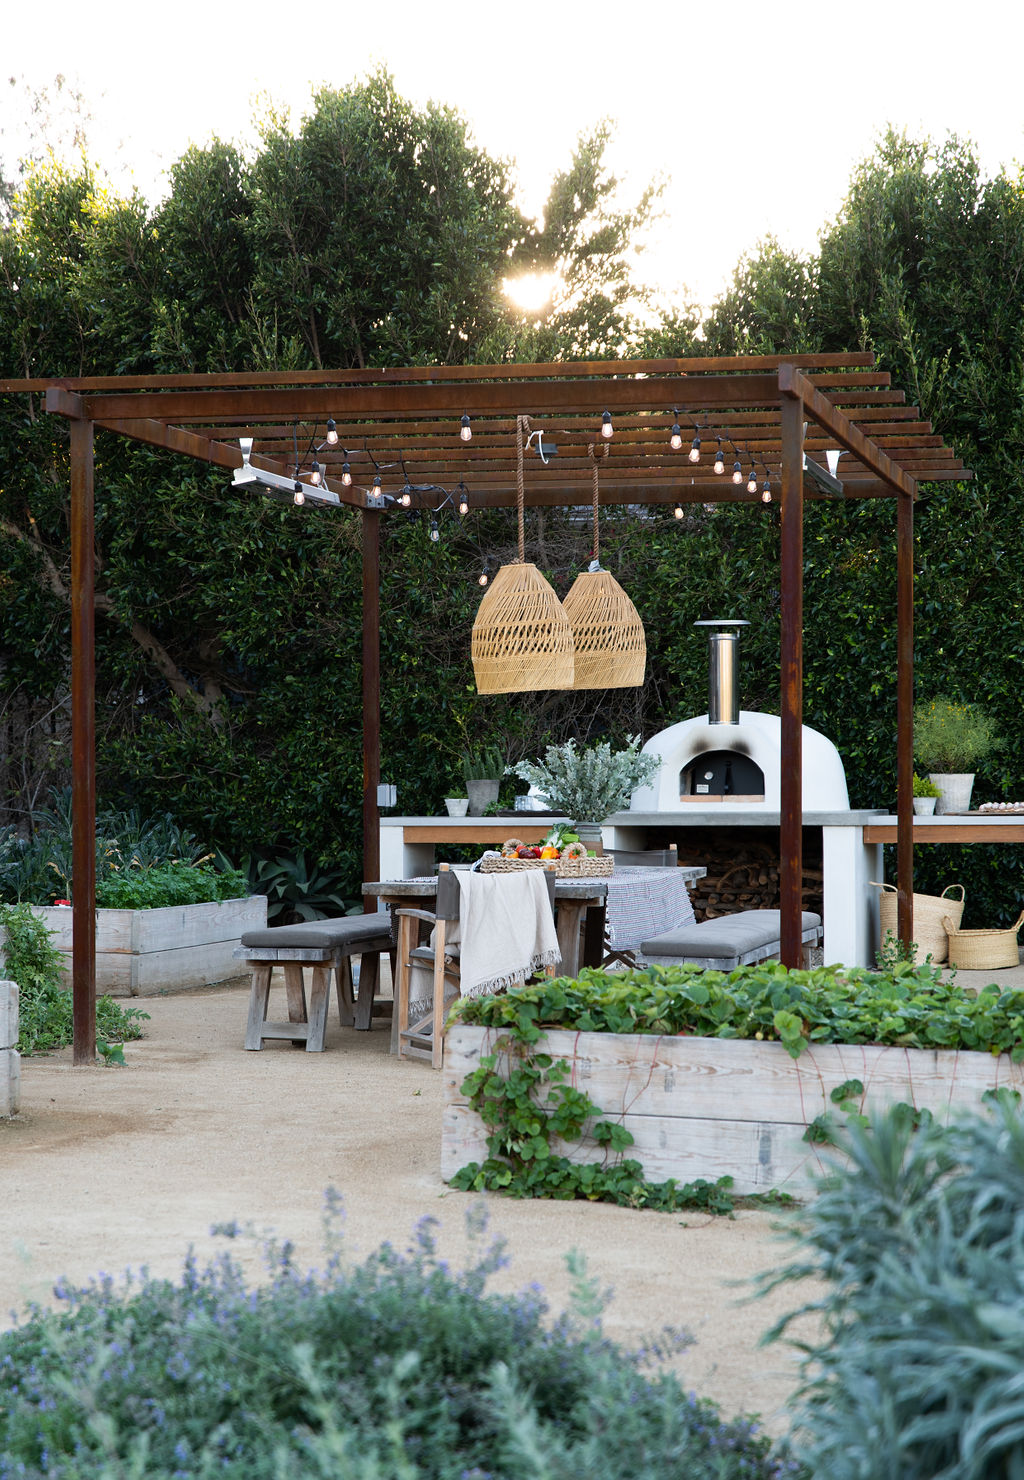 Malibu Modern Farmhouse by Burdge & Associates Architects in Malibu, California.  Outdoor Kitchen. #home #architecture #house #homeinspo #homedesign #outdoorkitchen #outdoordecor #outdoorfirepit #firepit #garden #gardening #veggiegarden